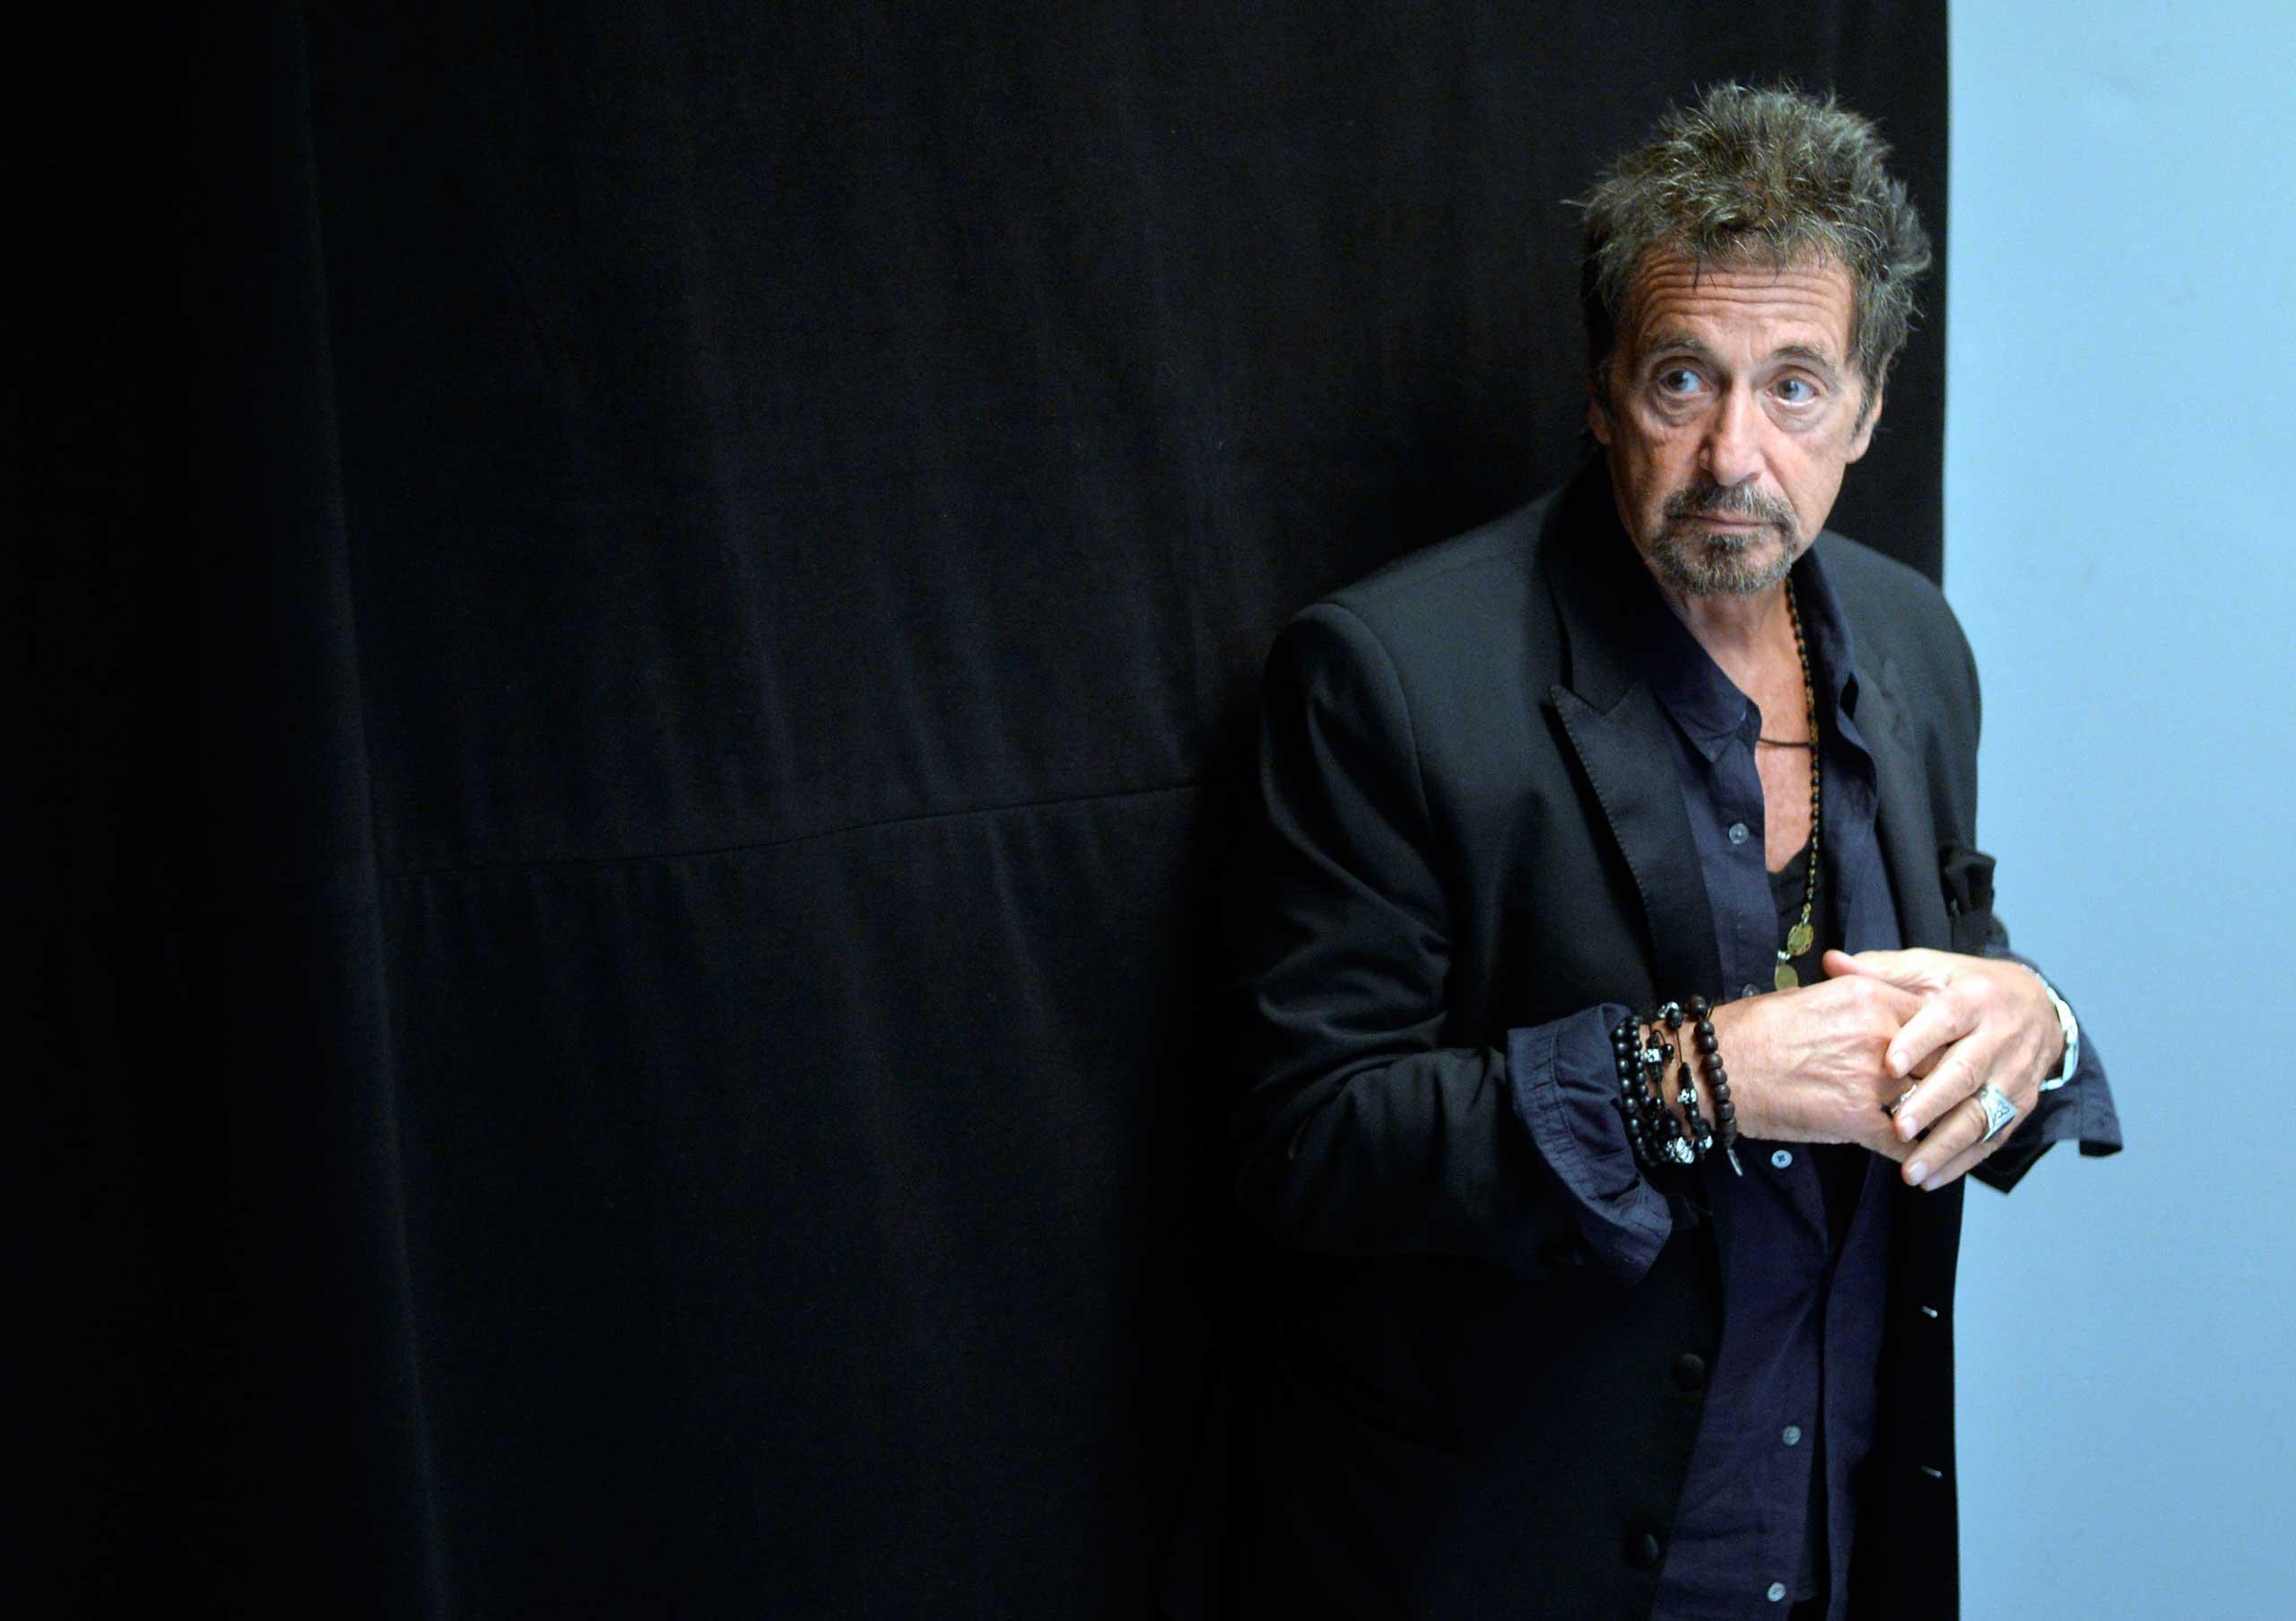 Al Pacino at Toronto International Film Festival on Sept. 7, 2014.